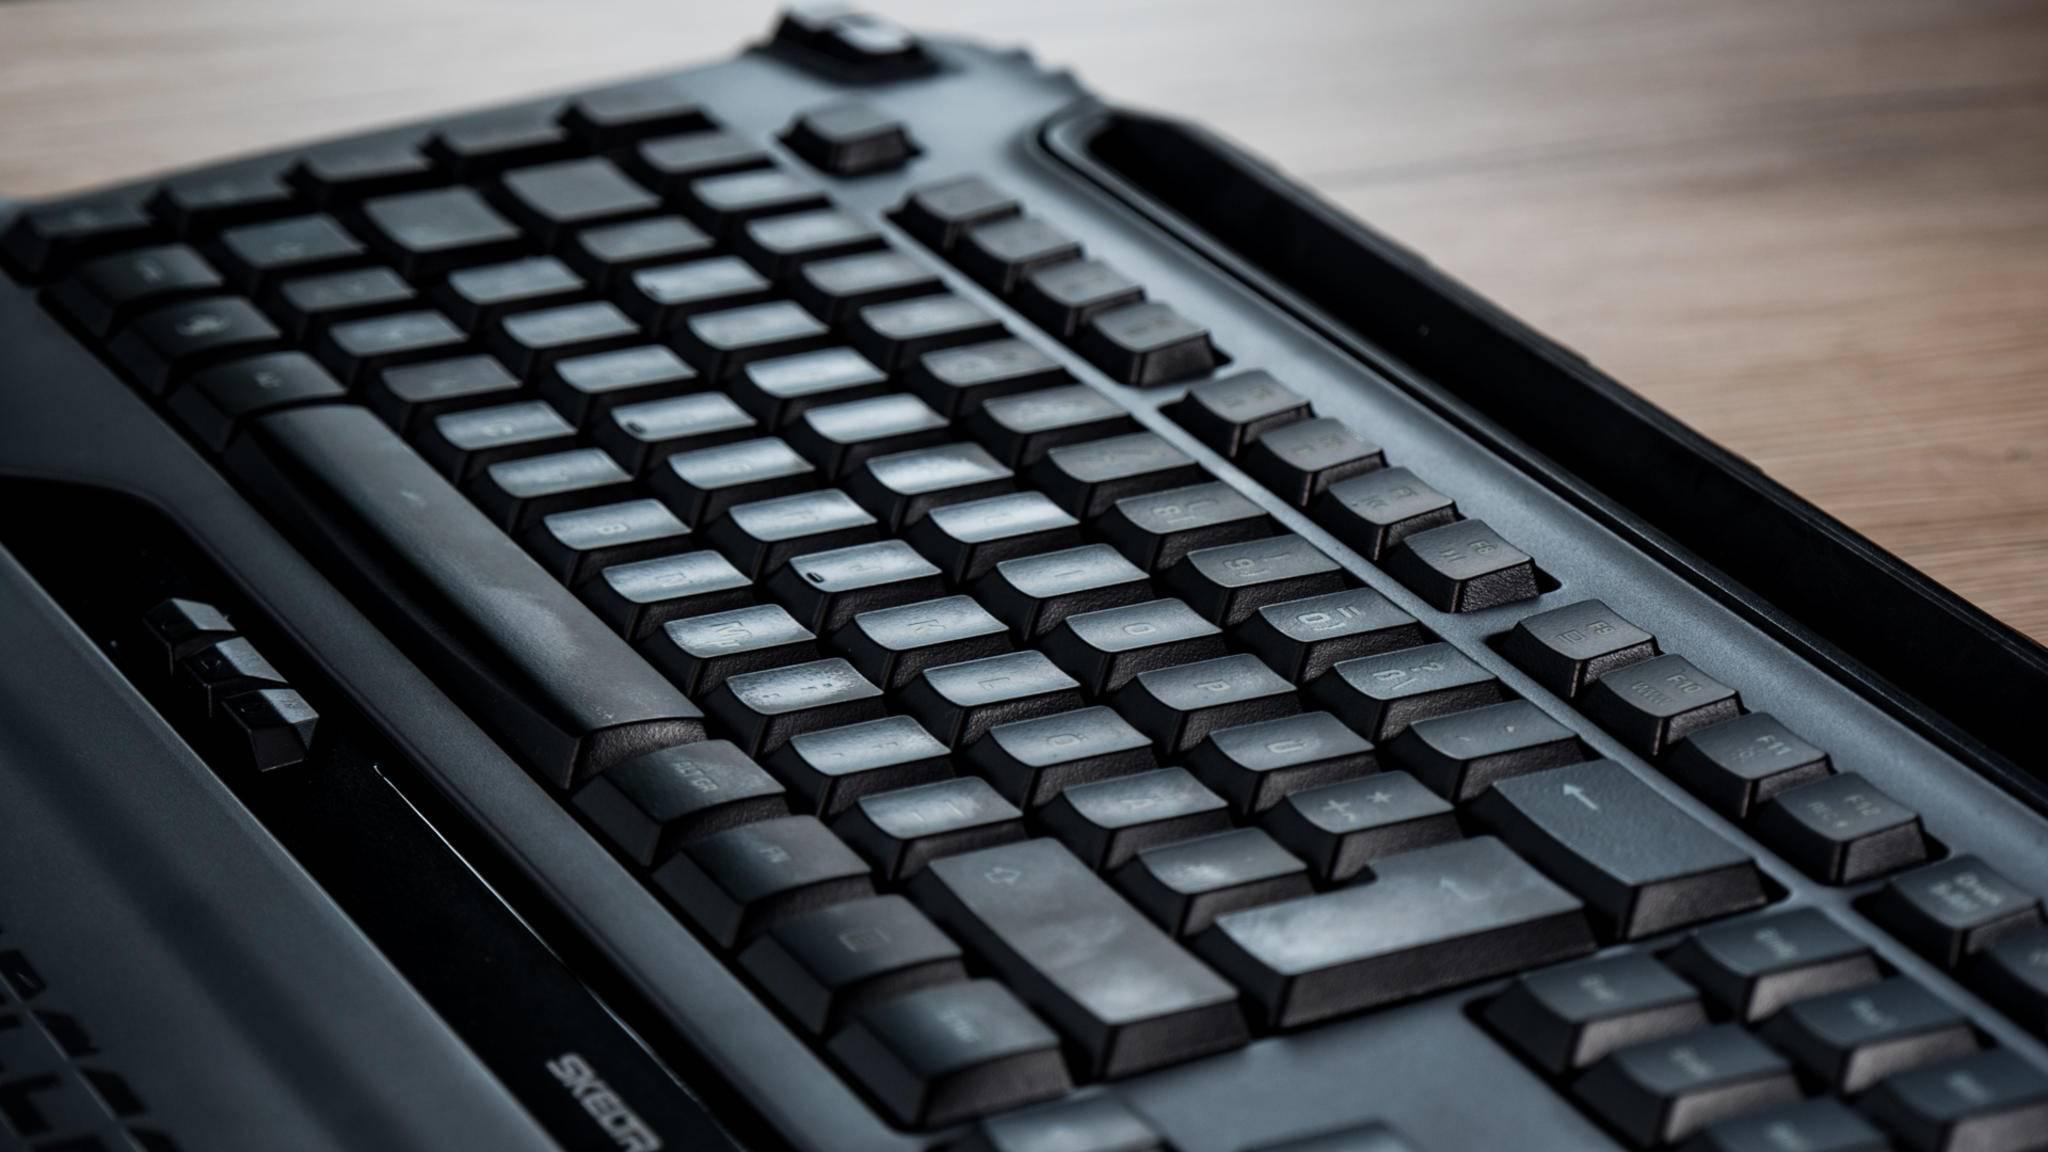 Keyboard-Shortcuts beschleunigen den Arbeitsfluss.